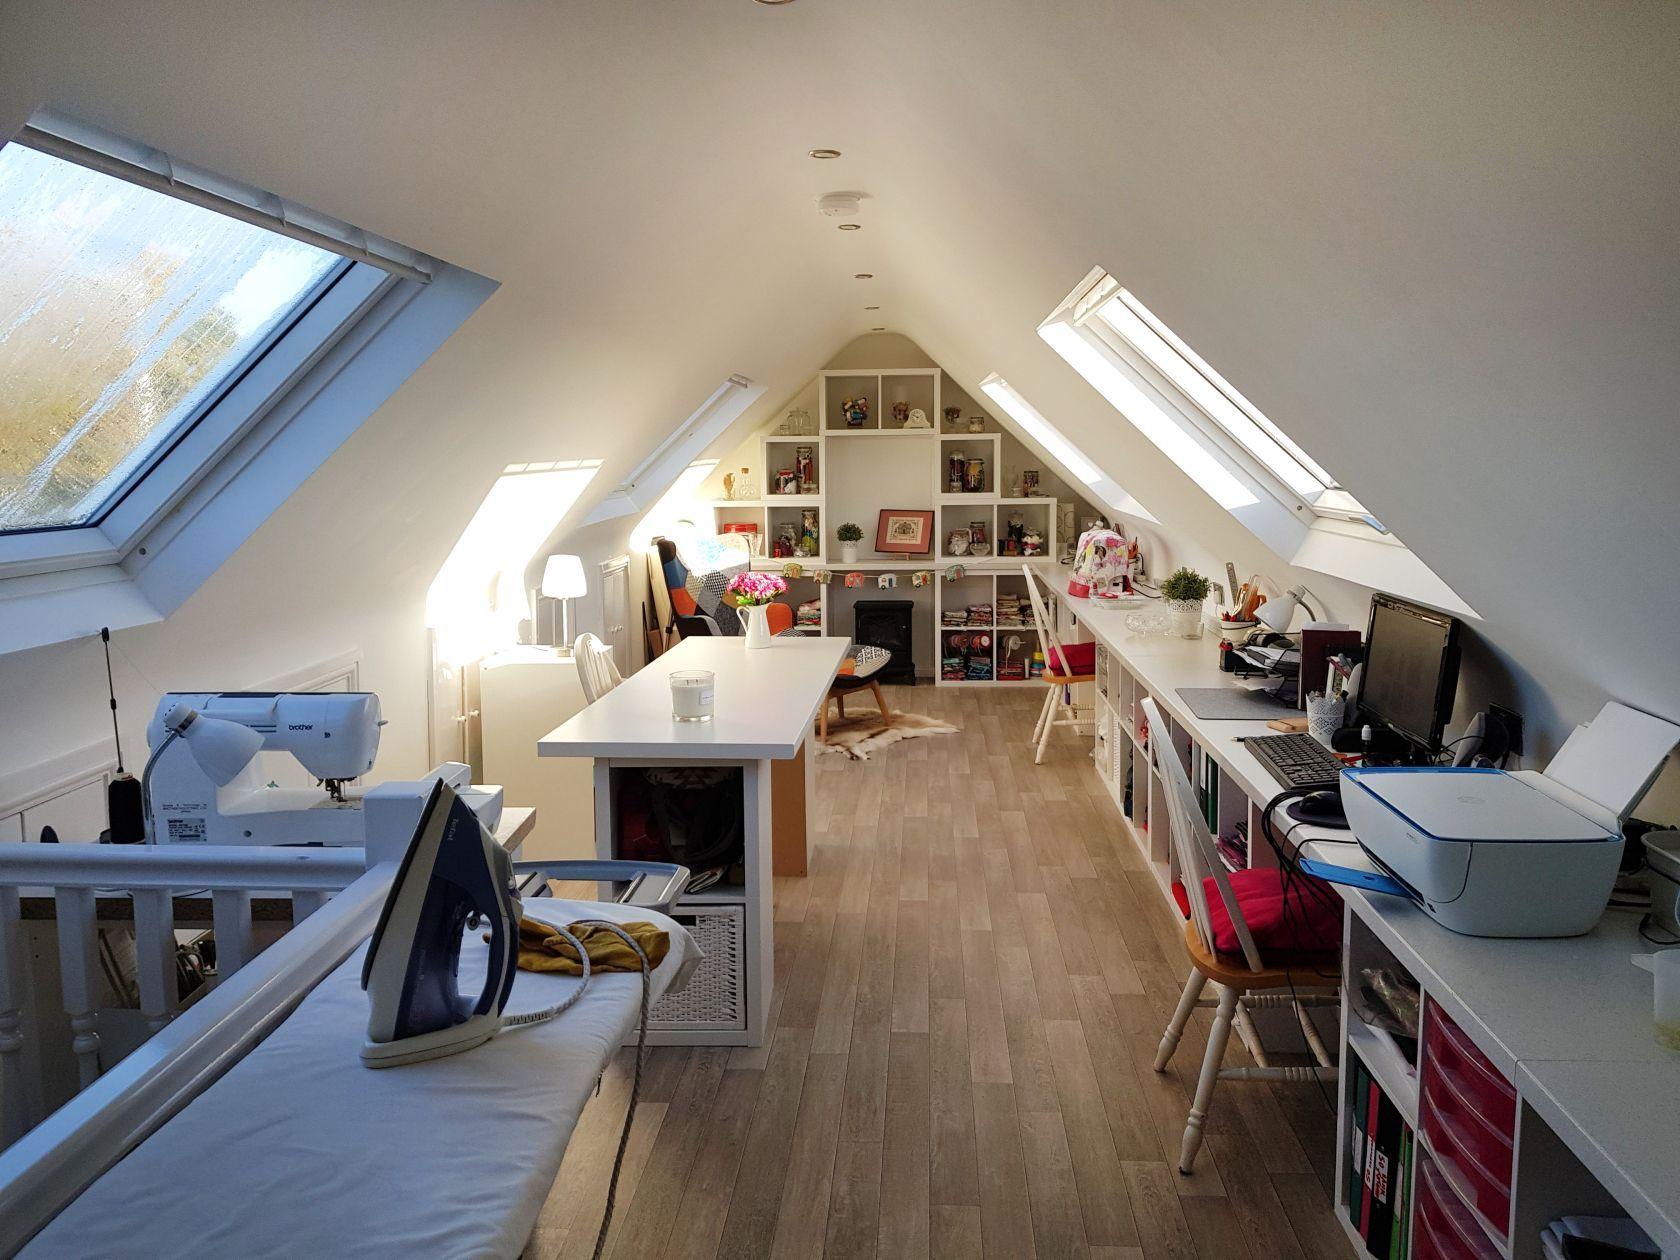 19 Inspiring Attic Storage Slanted Ideas Attic Craft Rooms Loft Room Home